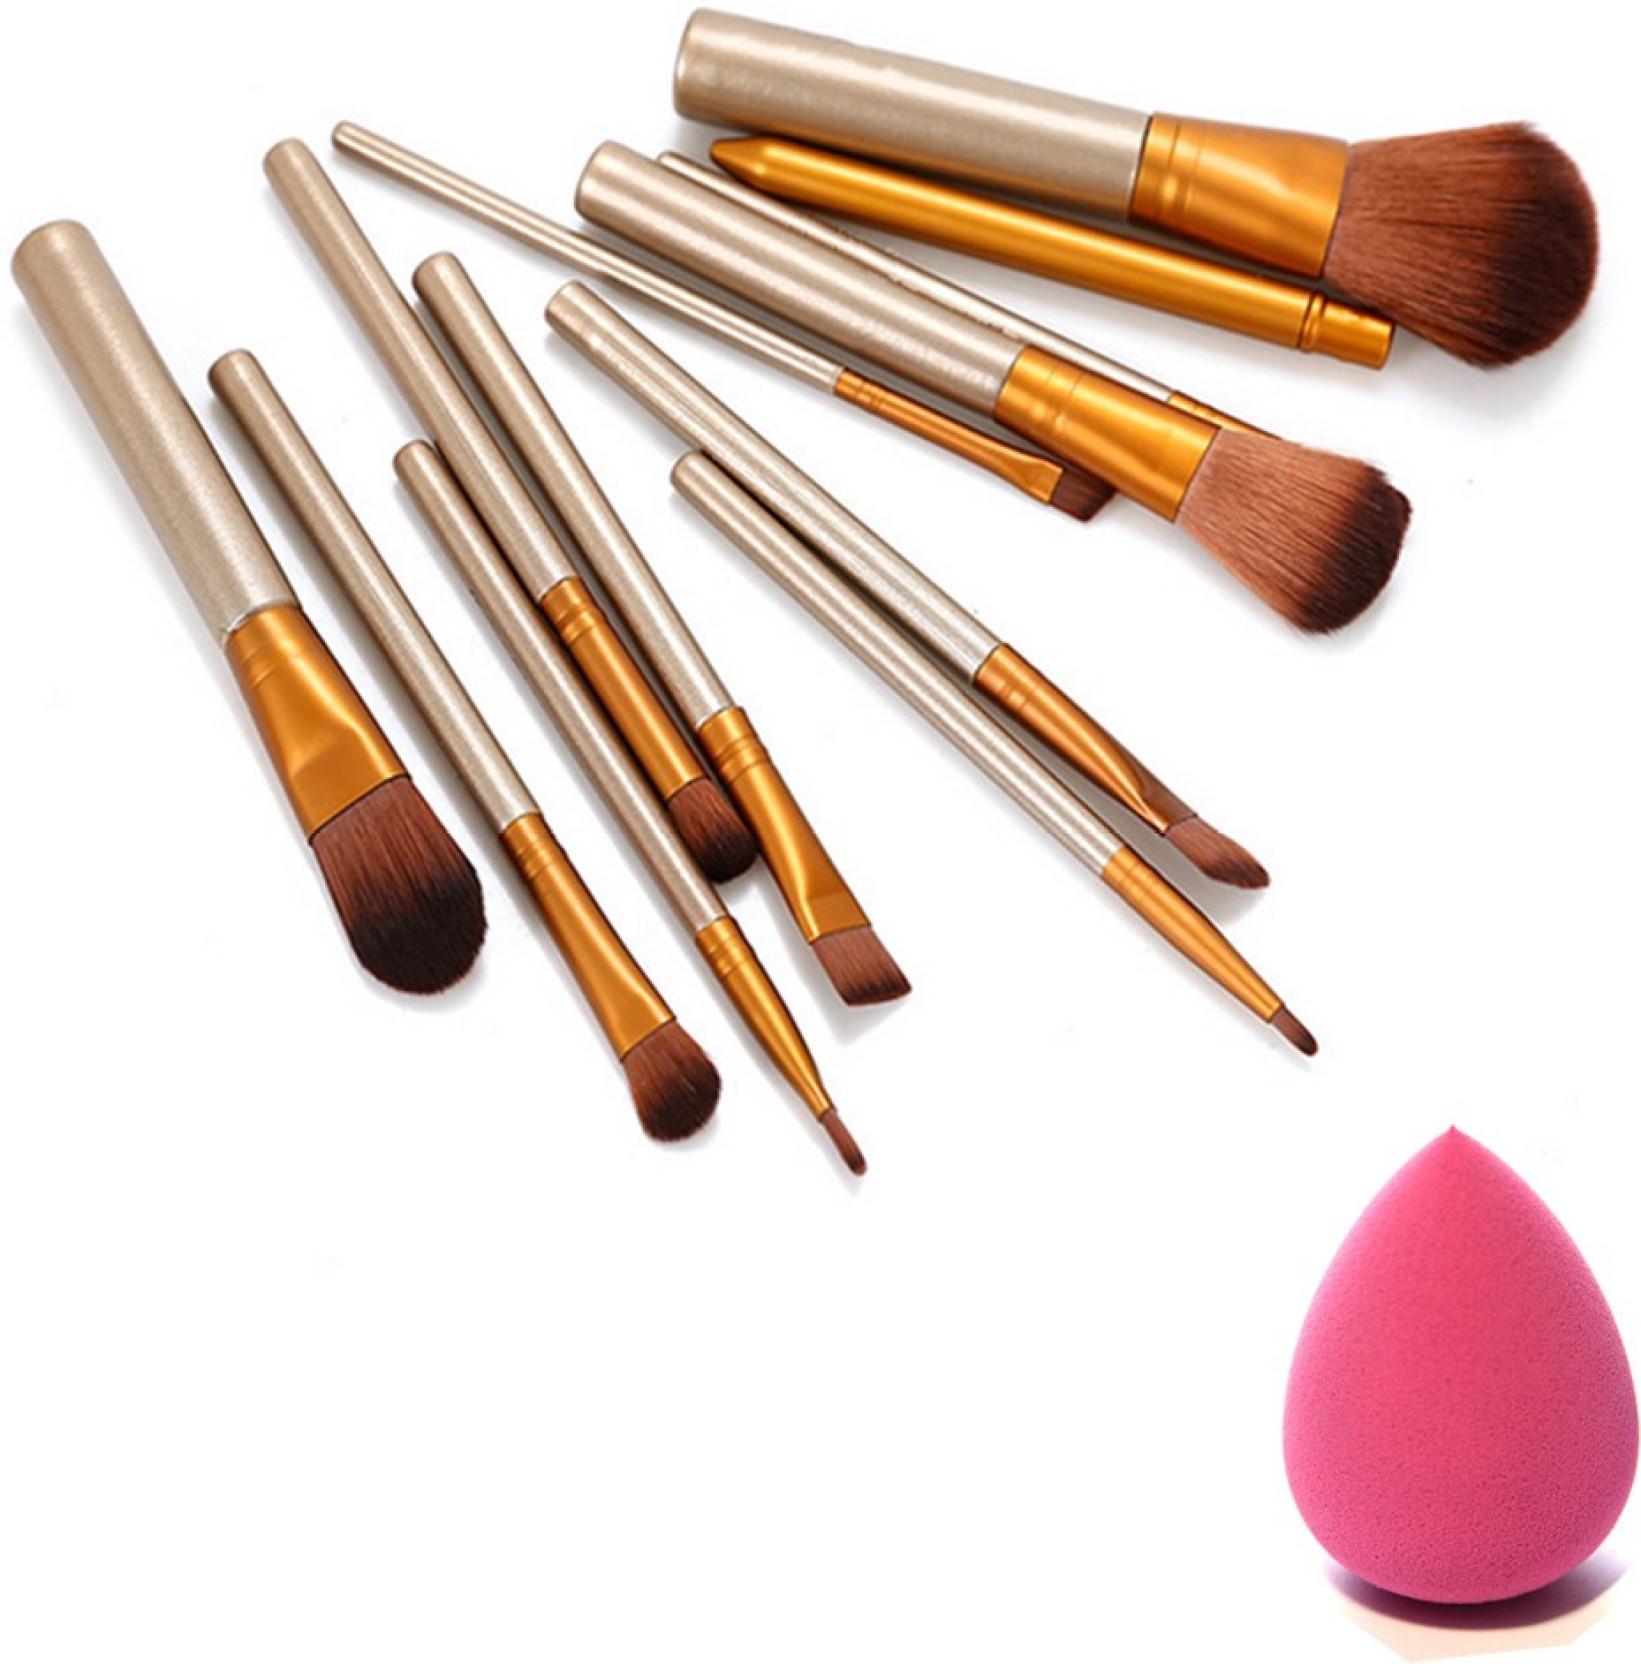 Magideal Generic Makeup Brushes Set 12 Eyebrow Foundation Powder Kuas Kabuki Hello Kitty Share